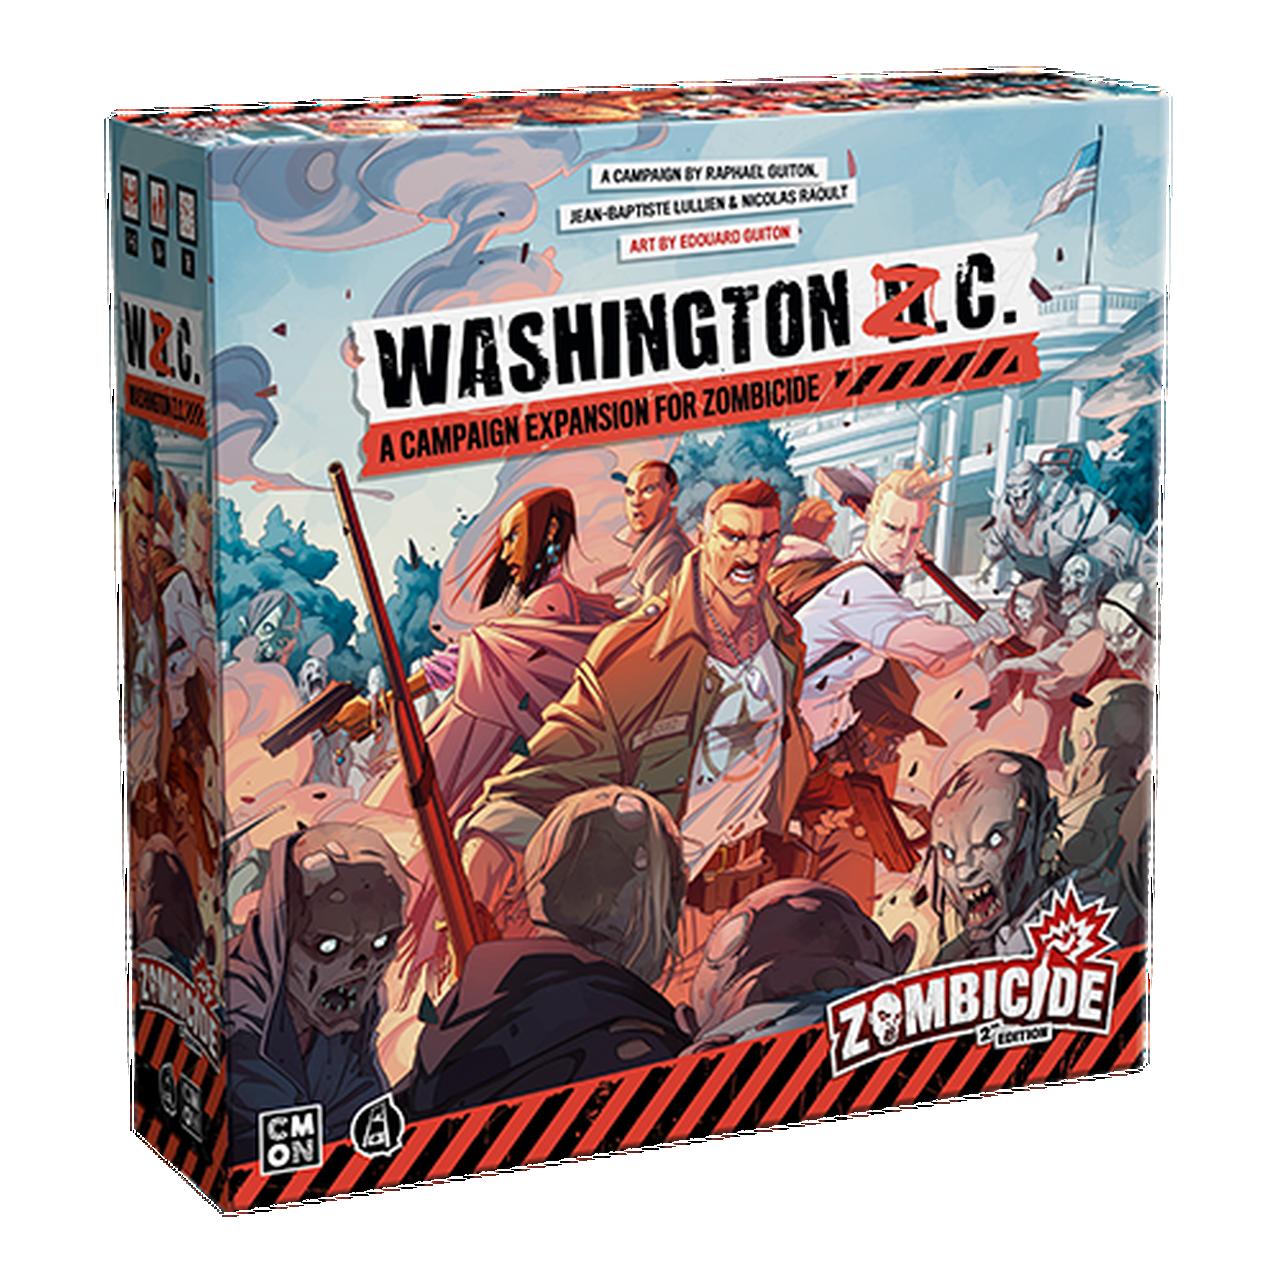 ZCD002 Zombicide Washington ZC Expansion